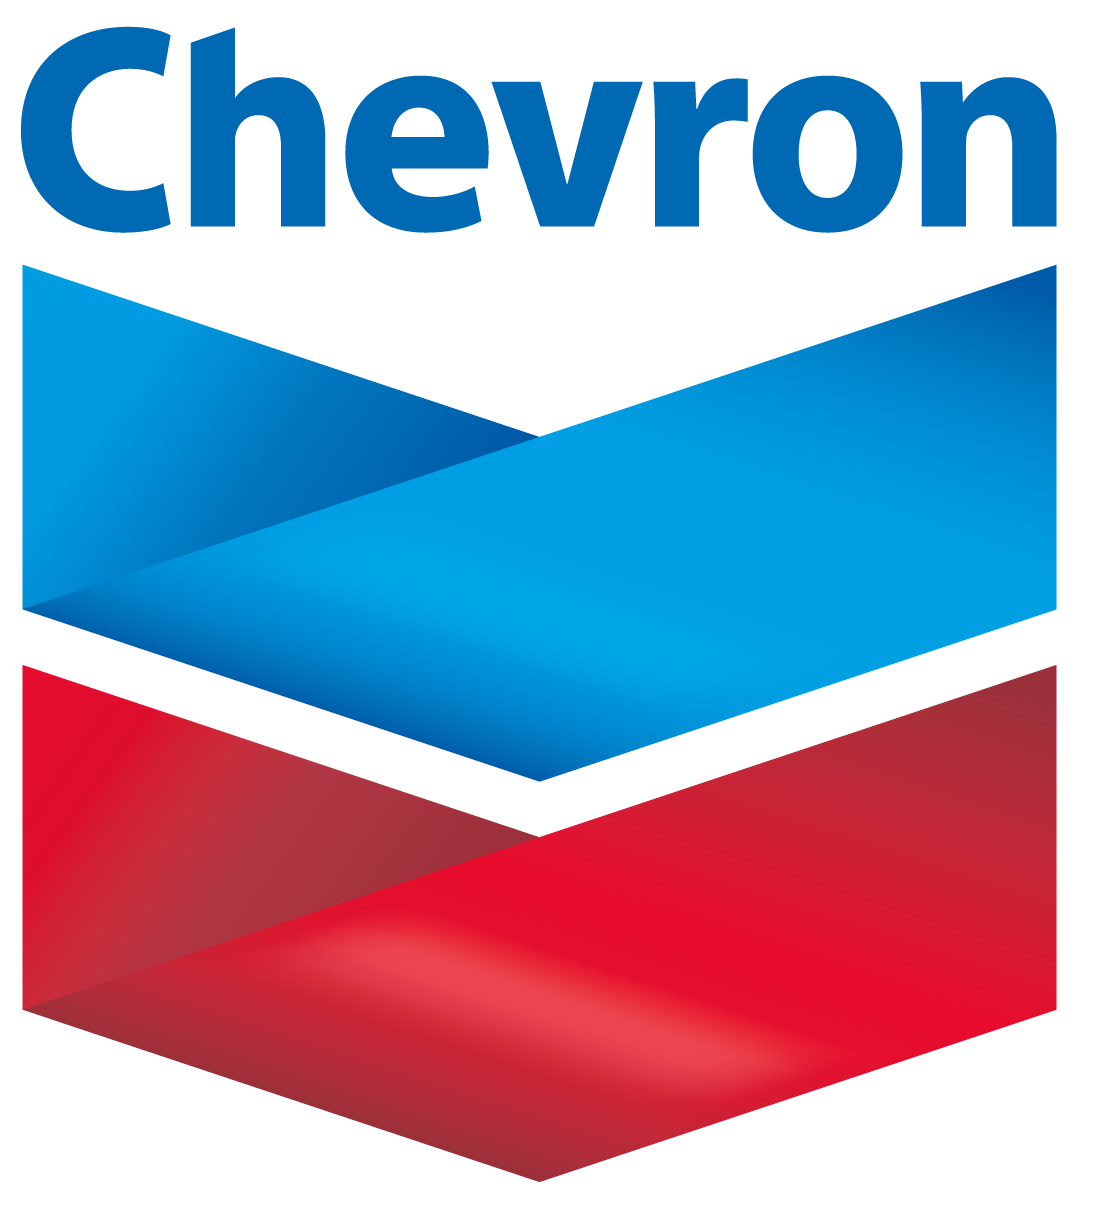 chevron-logo-2